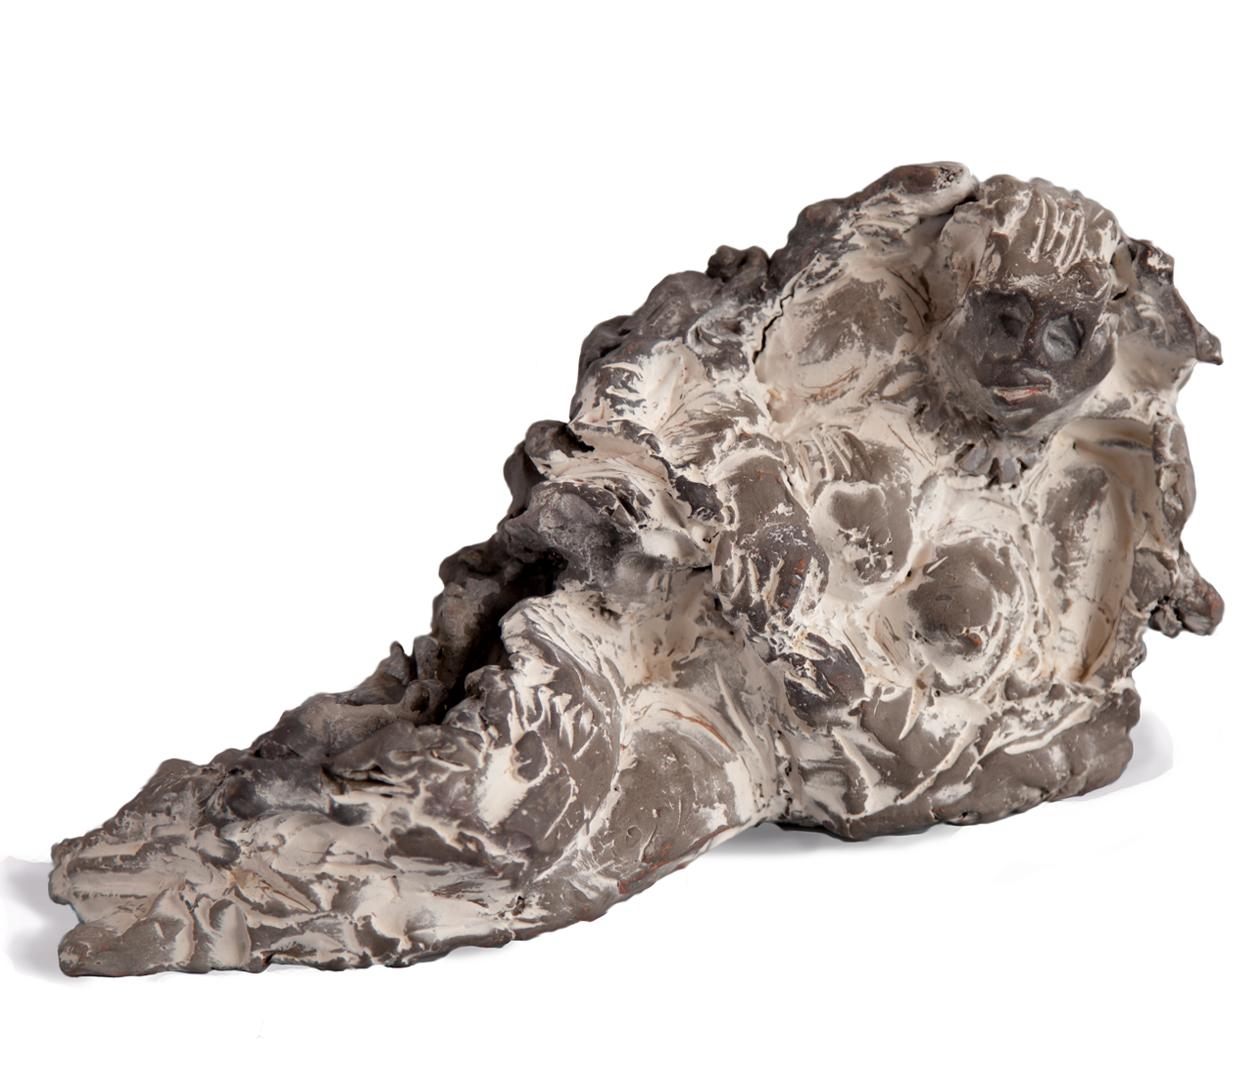 Grotte VI, 16x32x16 cm